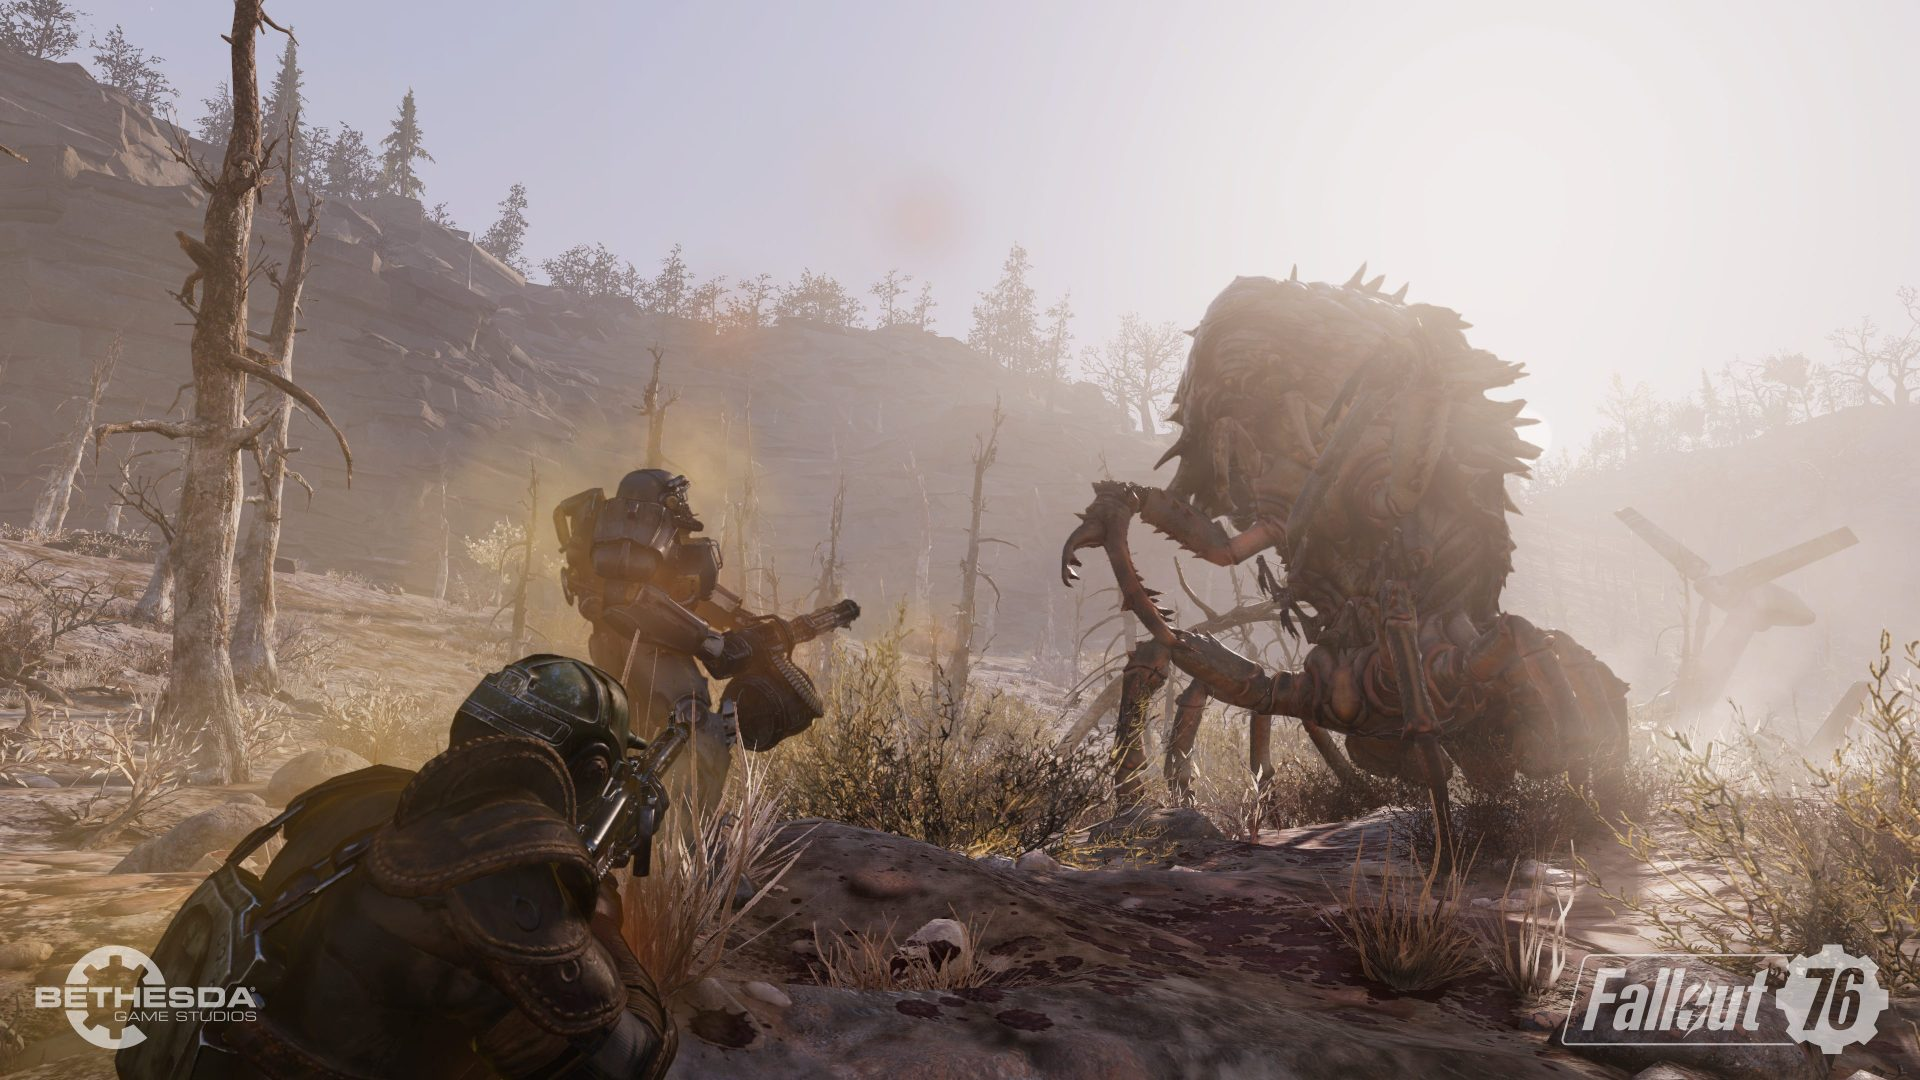 Fallout 76 Beta - Impressions by Aidan Bates | Invision Game